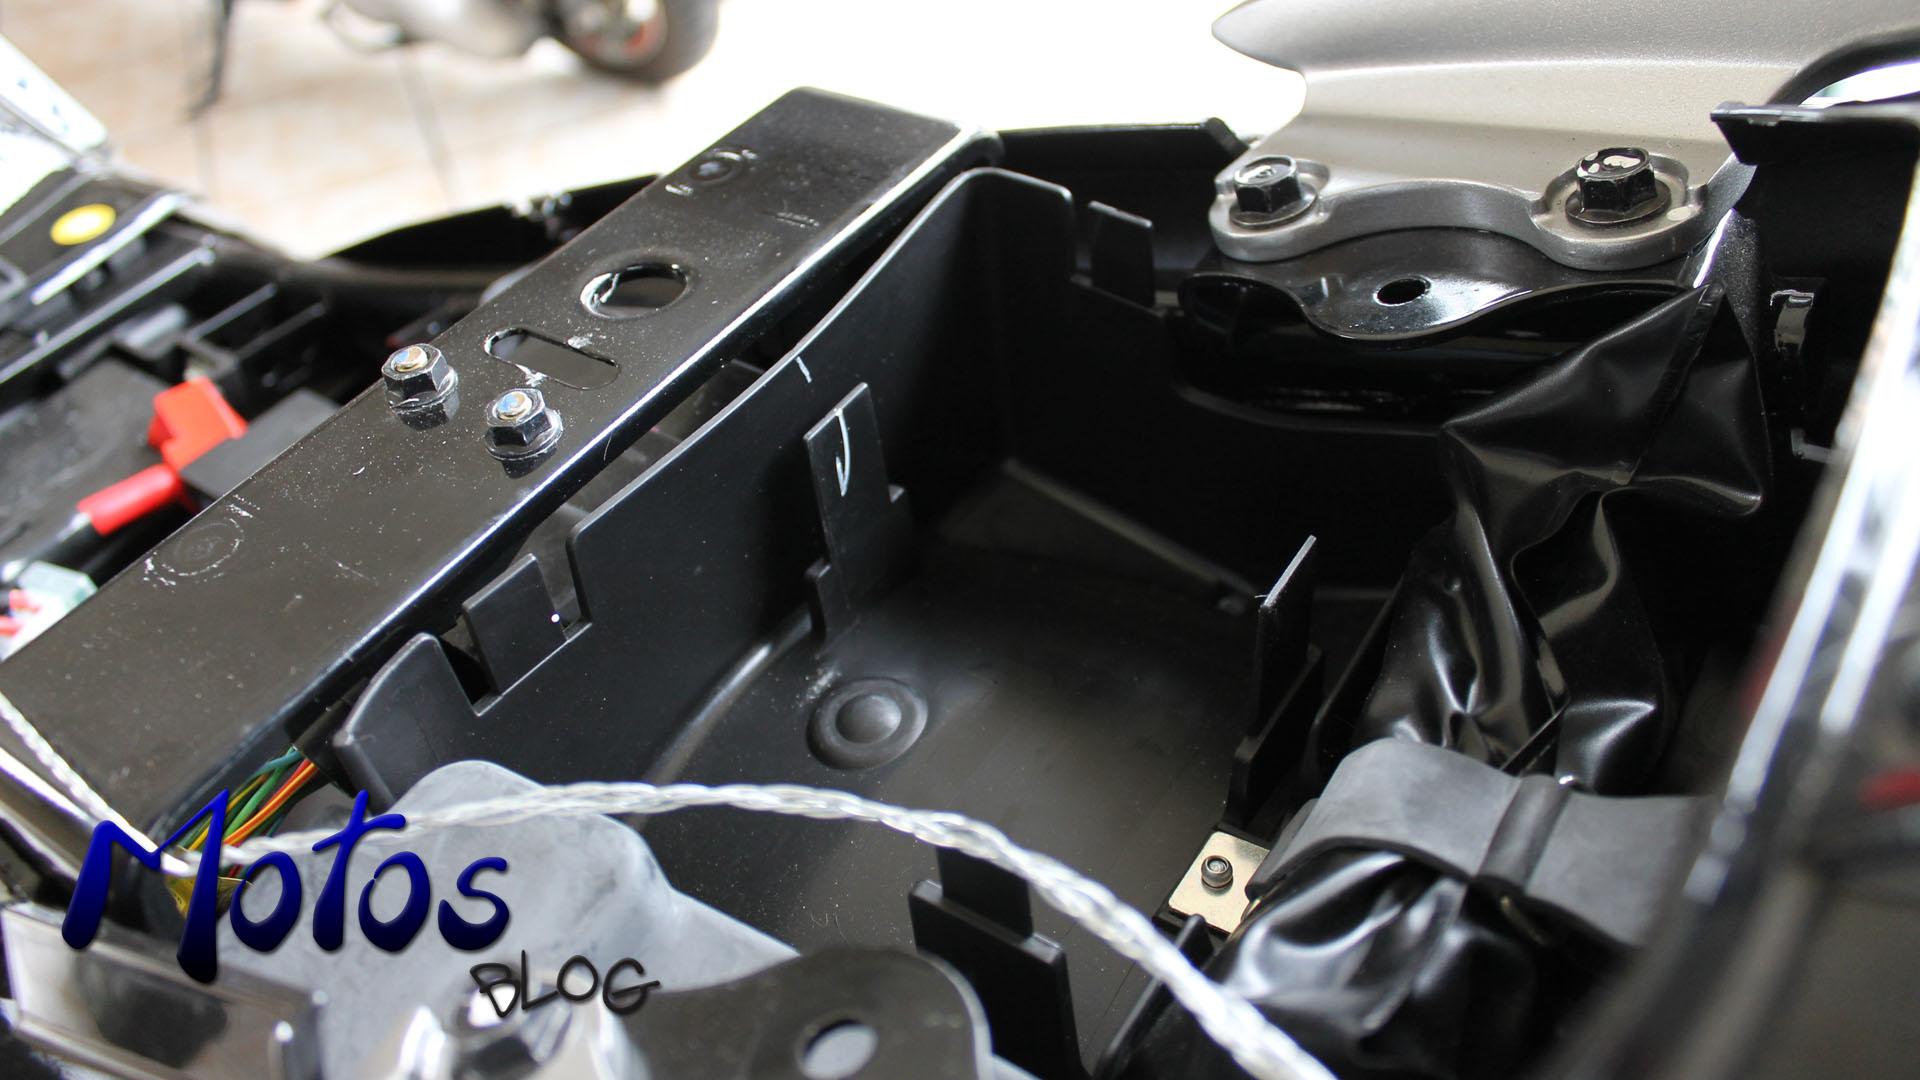 Porta objetos da Yamaha Fazer 250 Blueflex